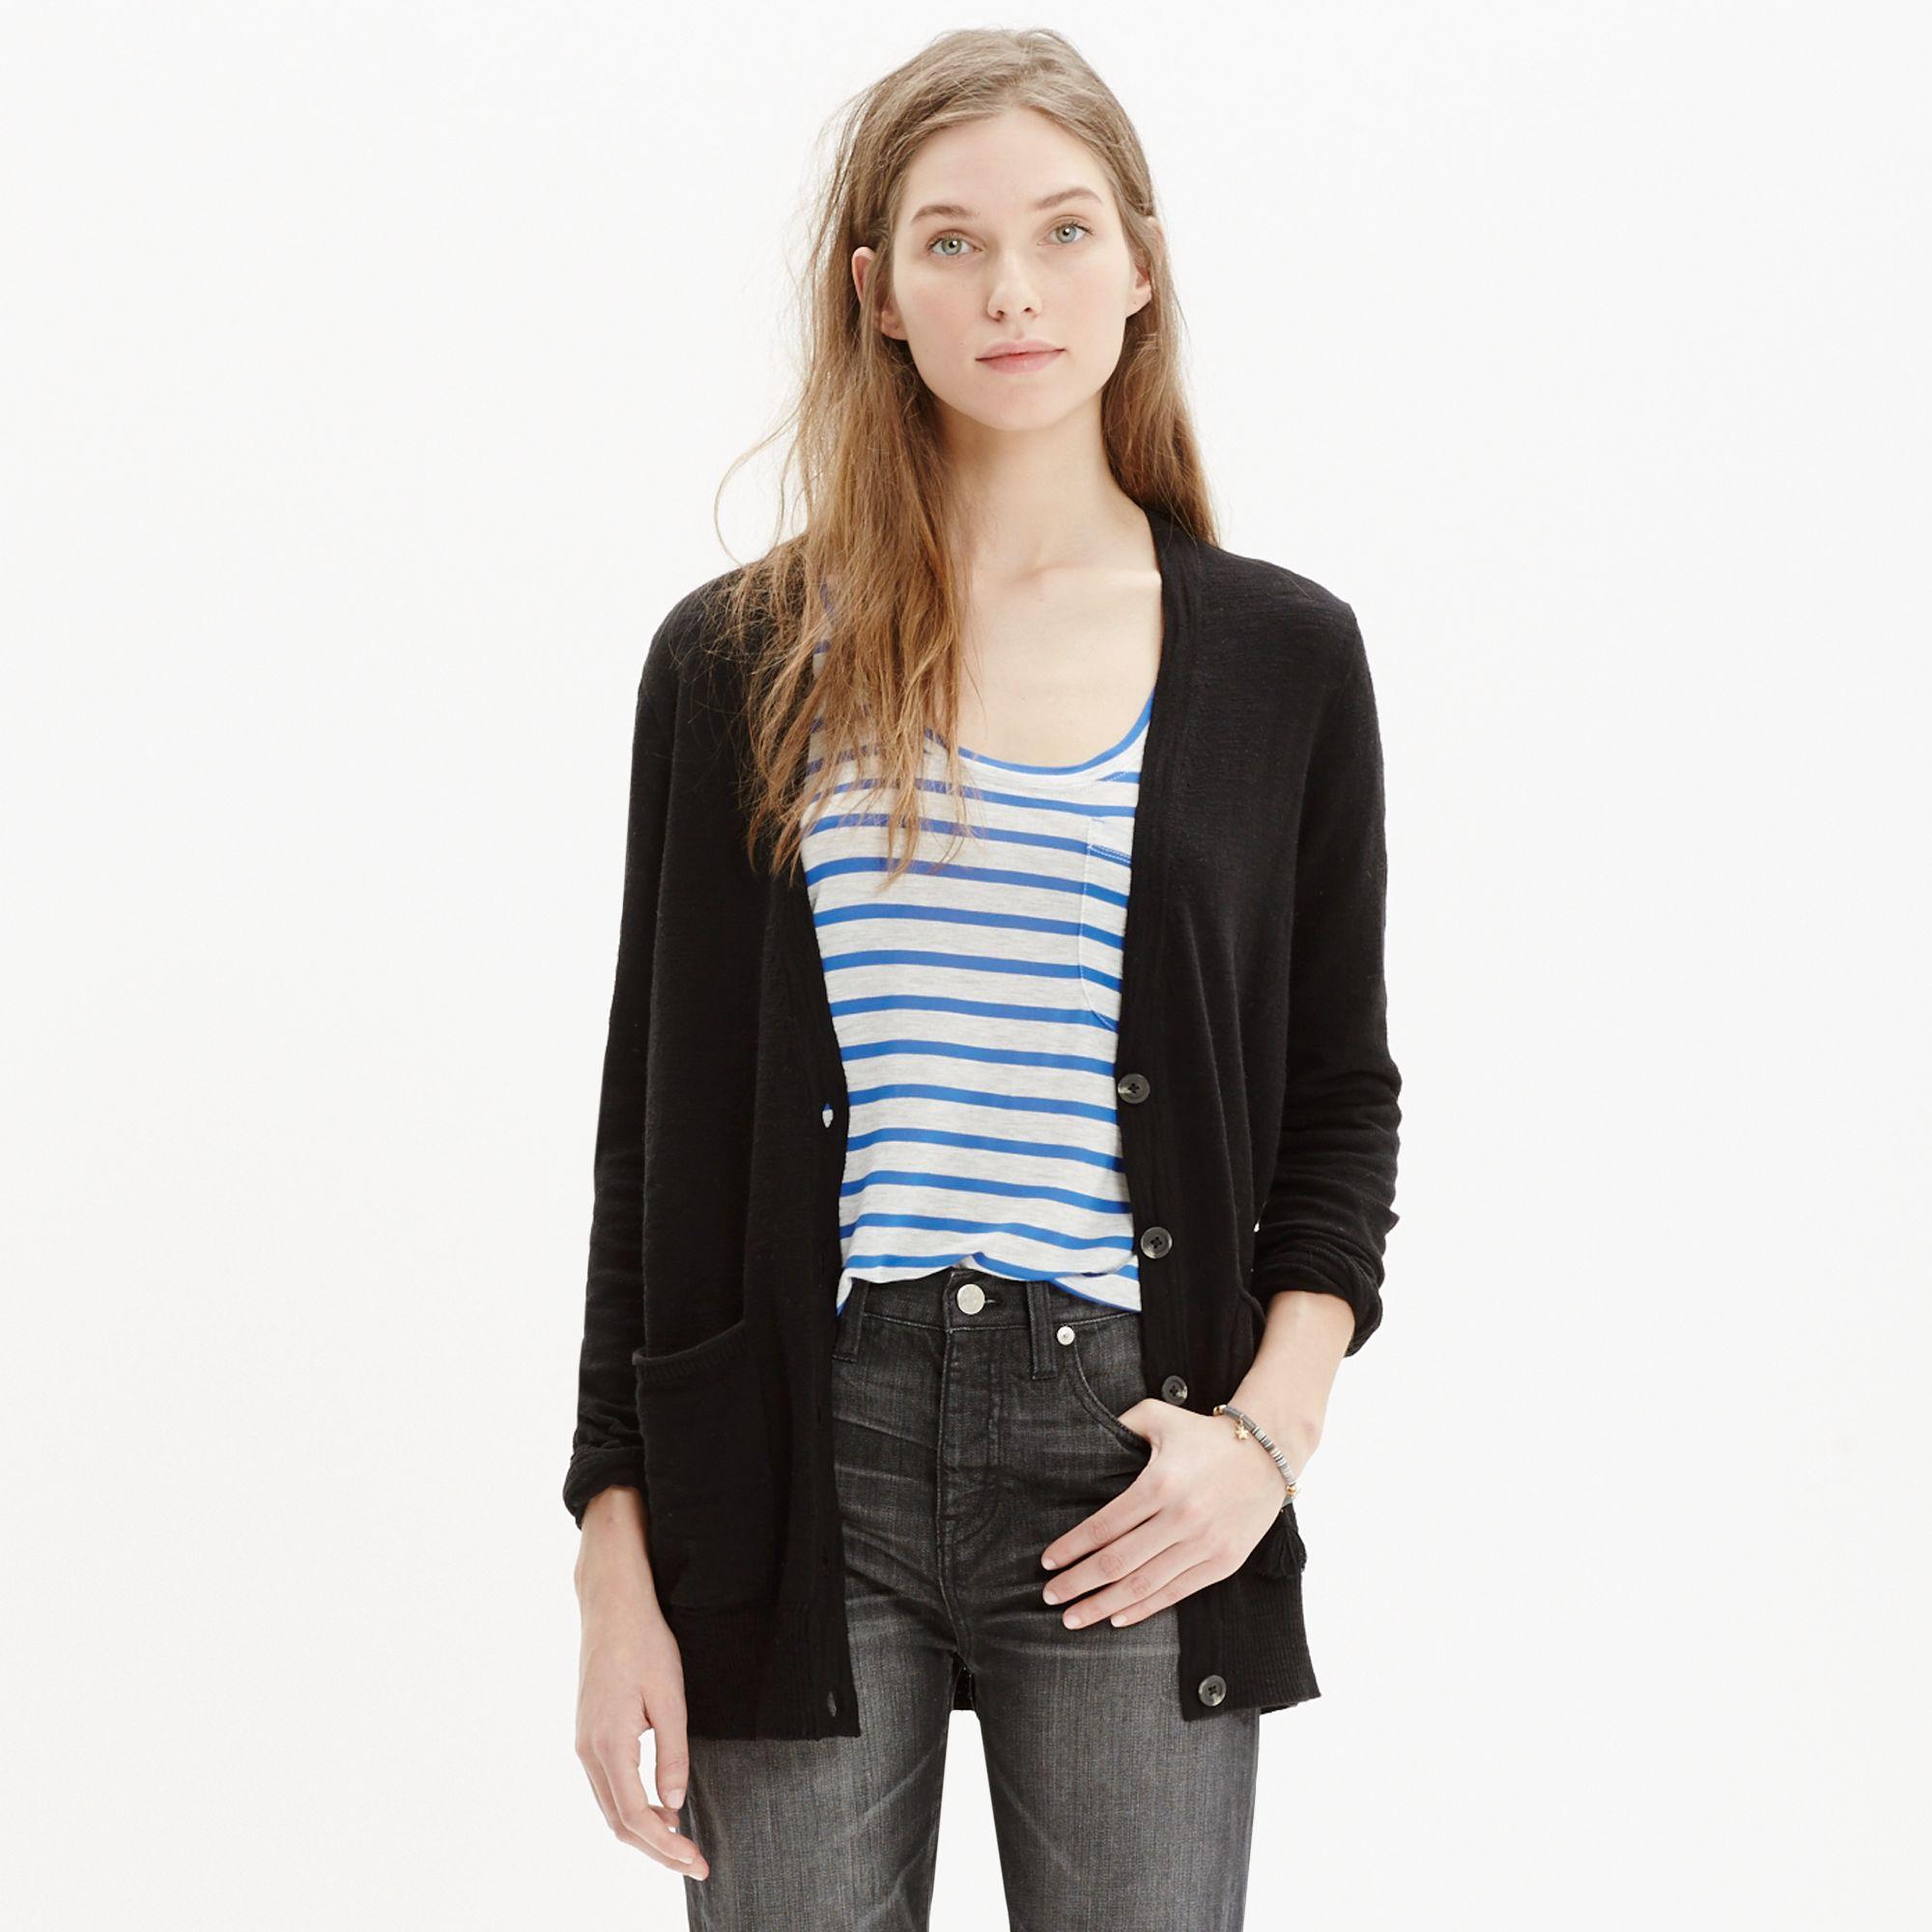 Madewell Graduate Cardigan Sweater in Black | Lyst